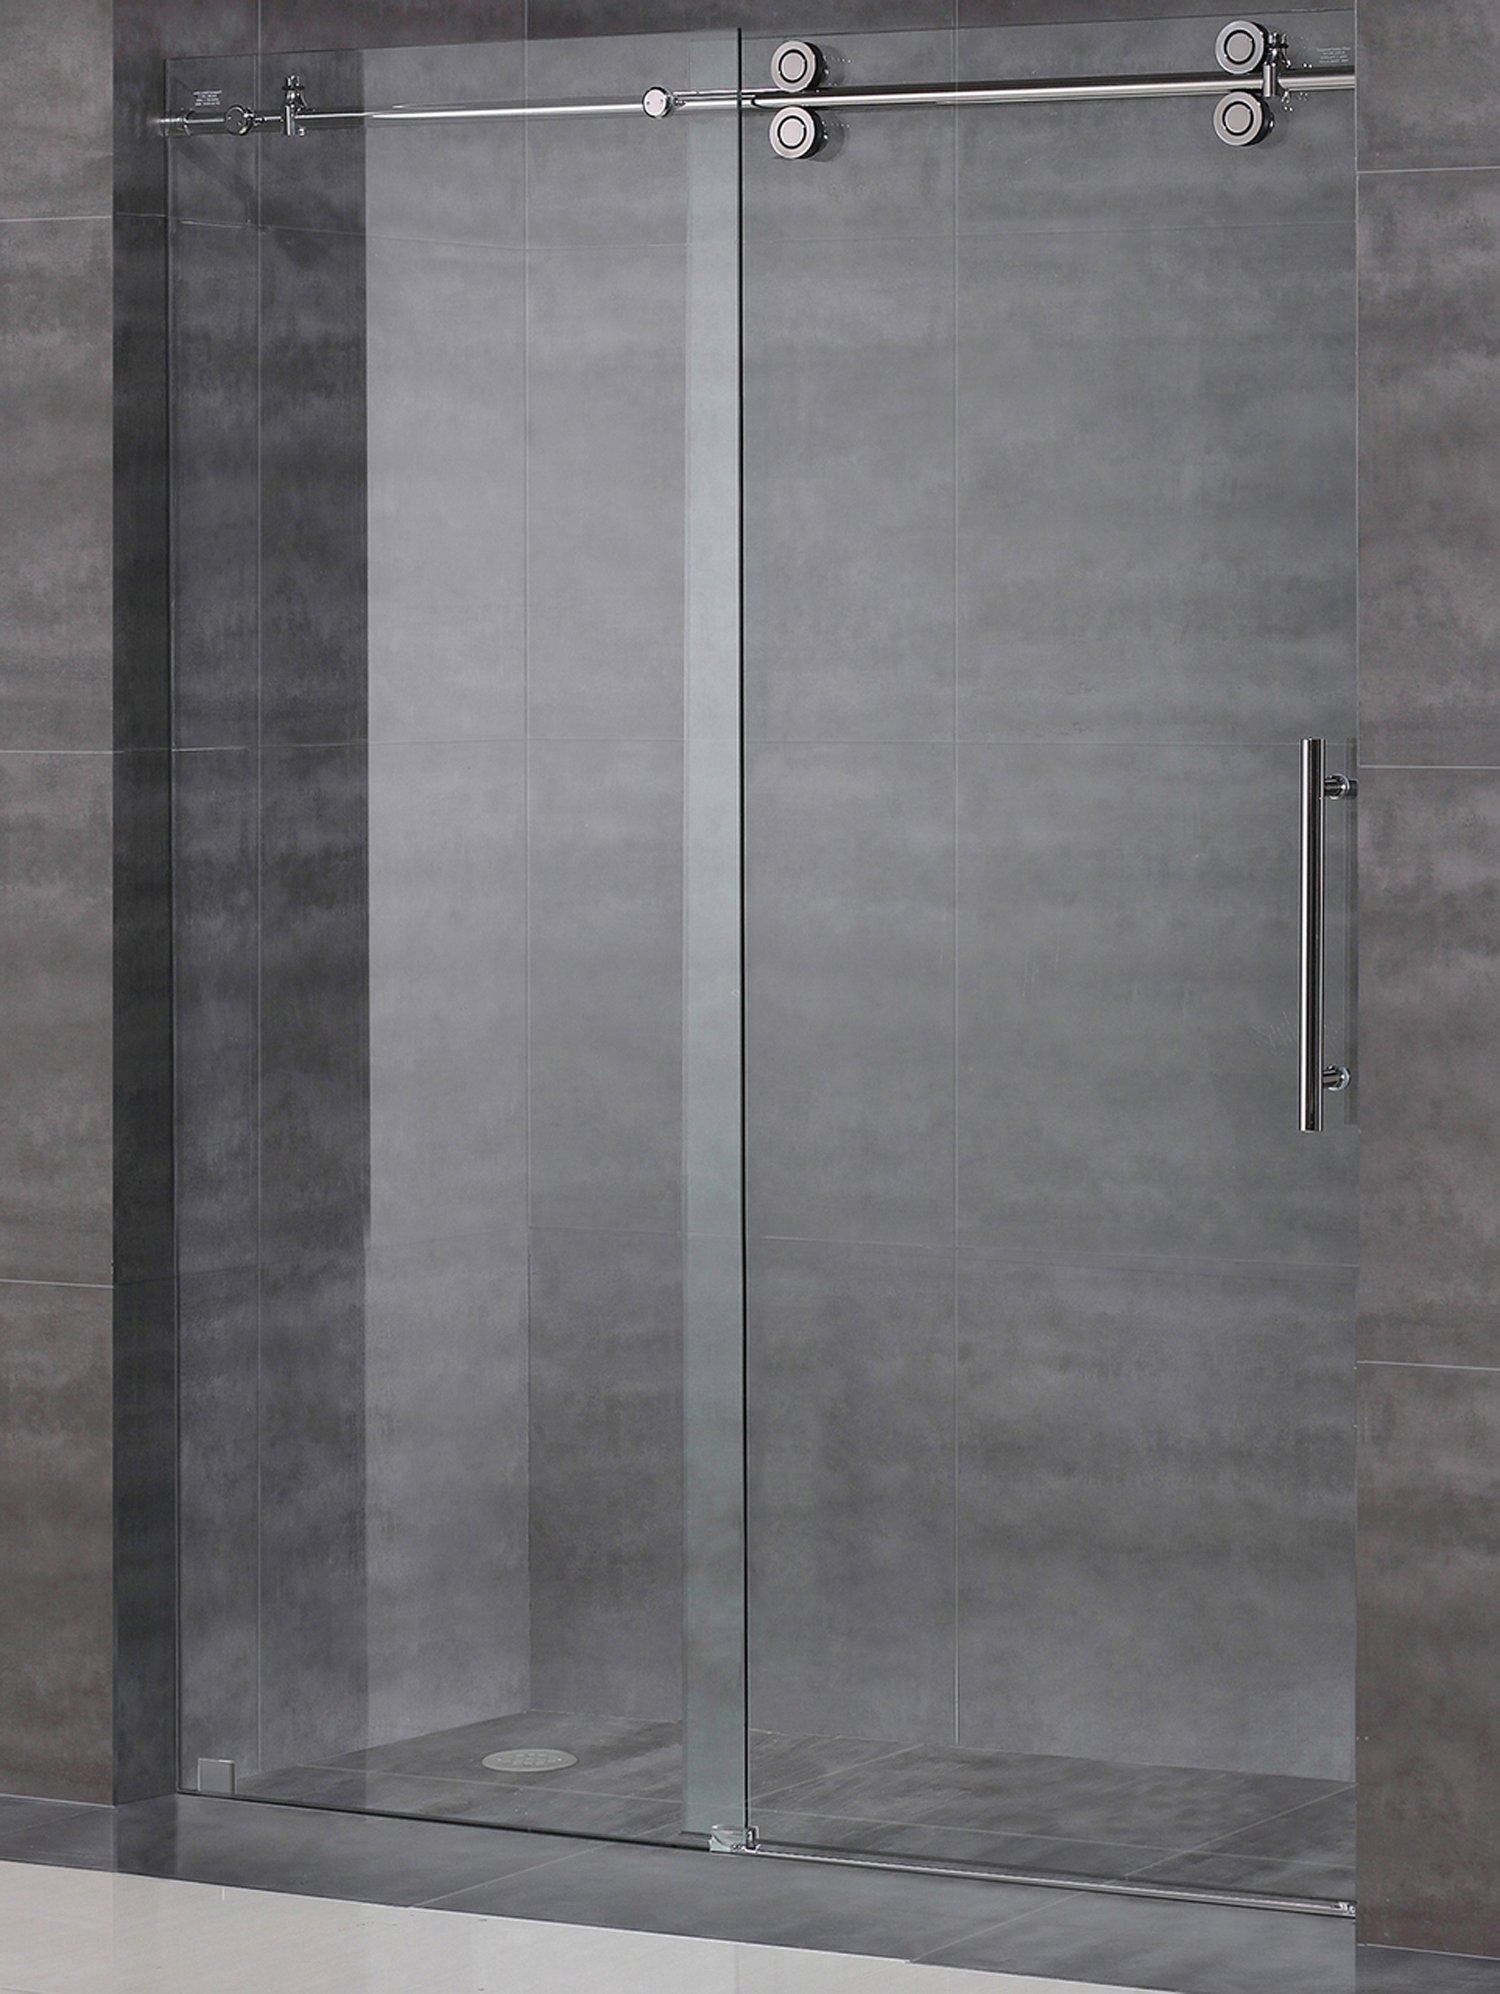 Frameless Sliding Shower Door Hardware Kit / Glass Door Not Included / Brushed Satin Finish - AquaLine III Series (6 Feet Rail Length)